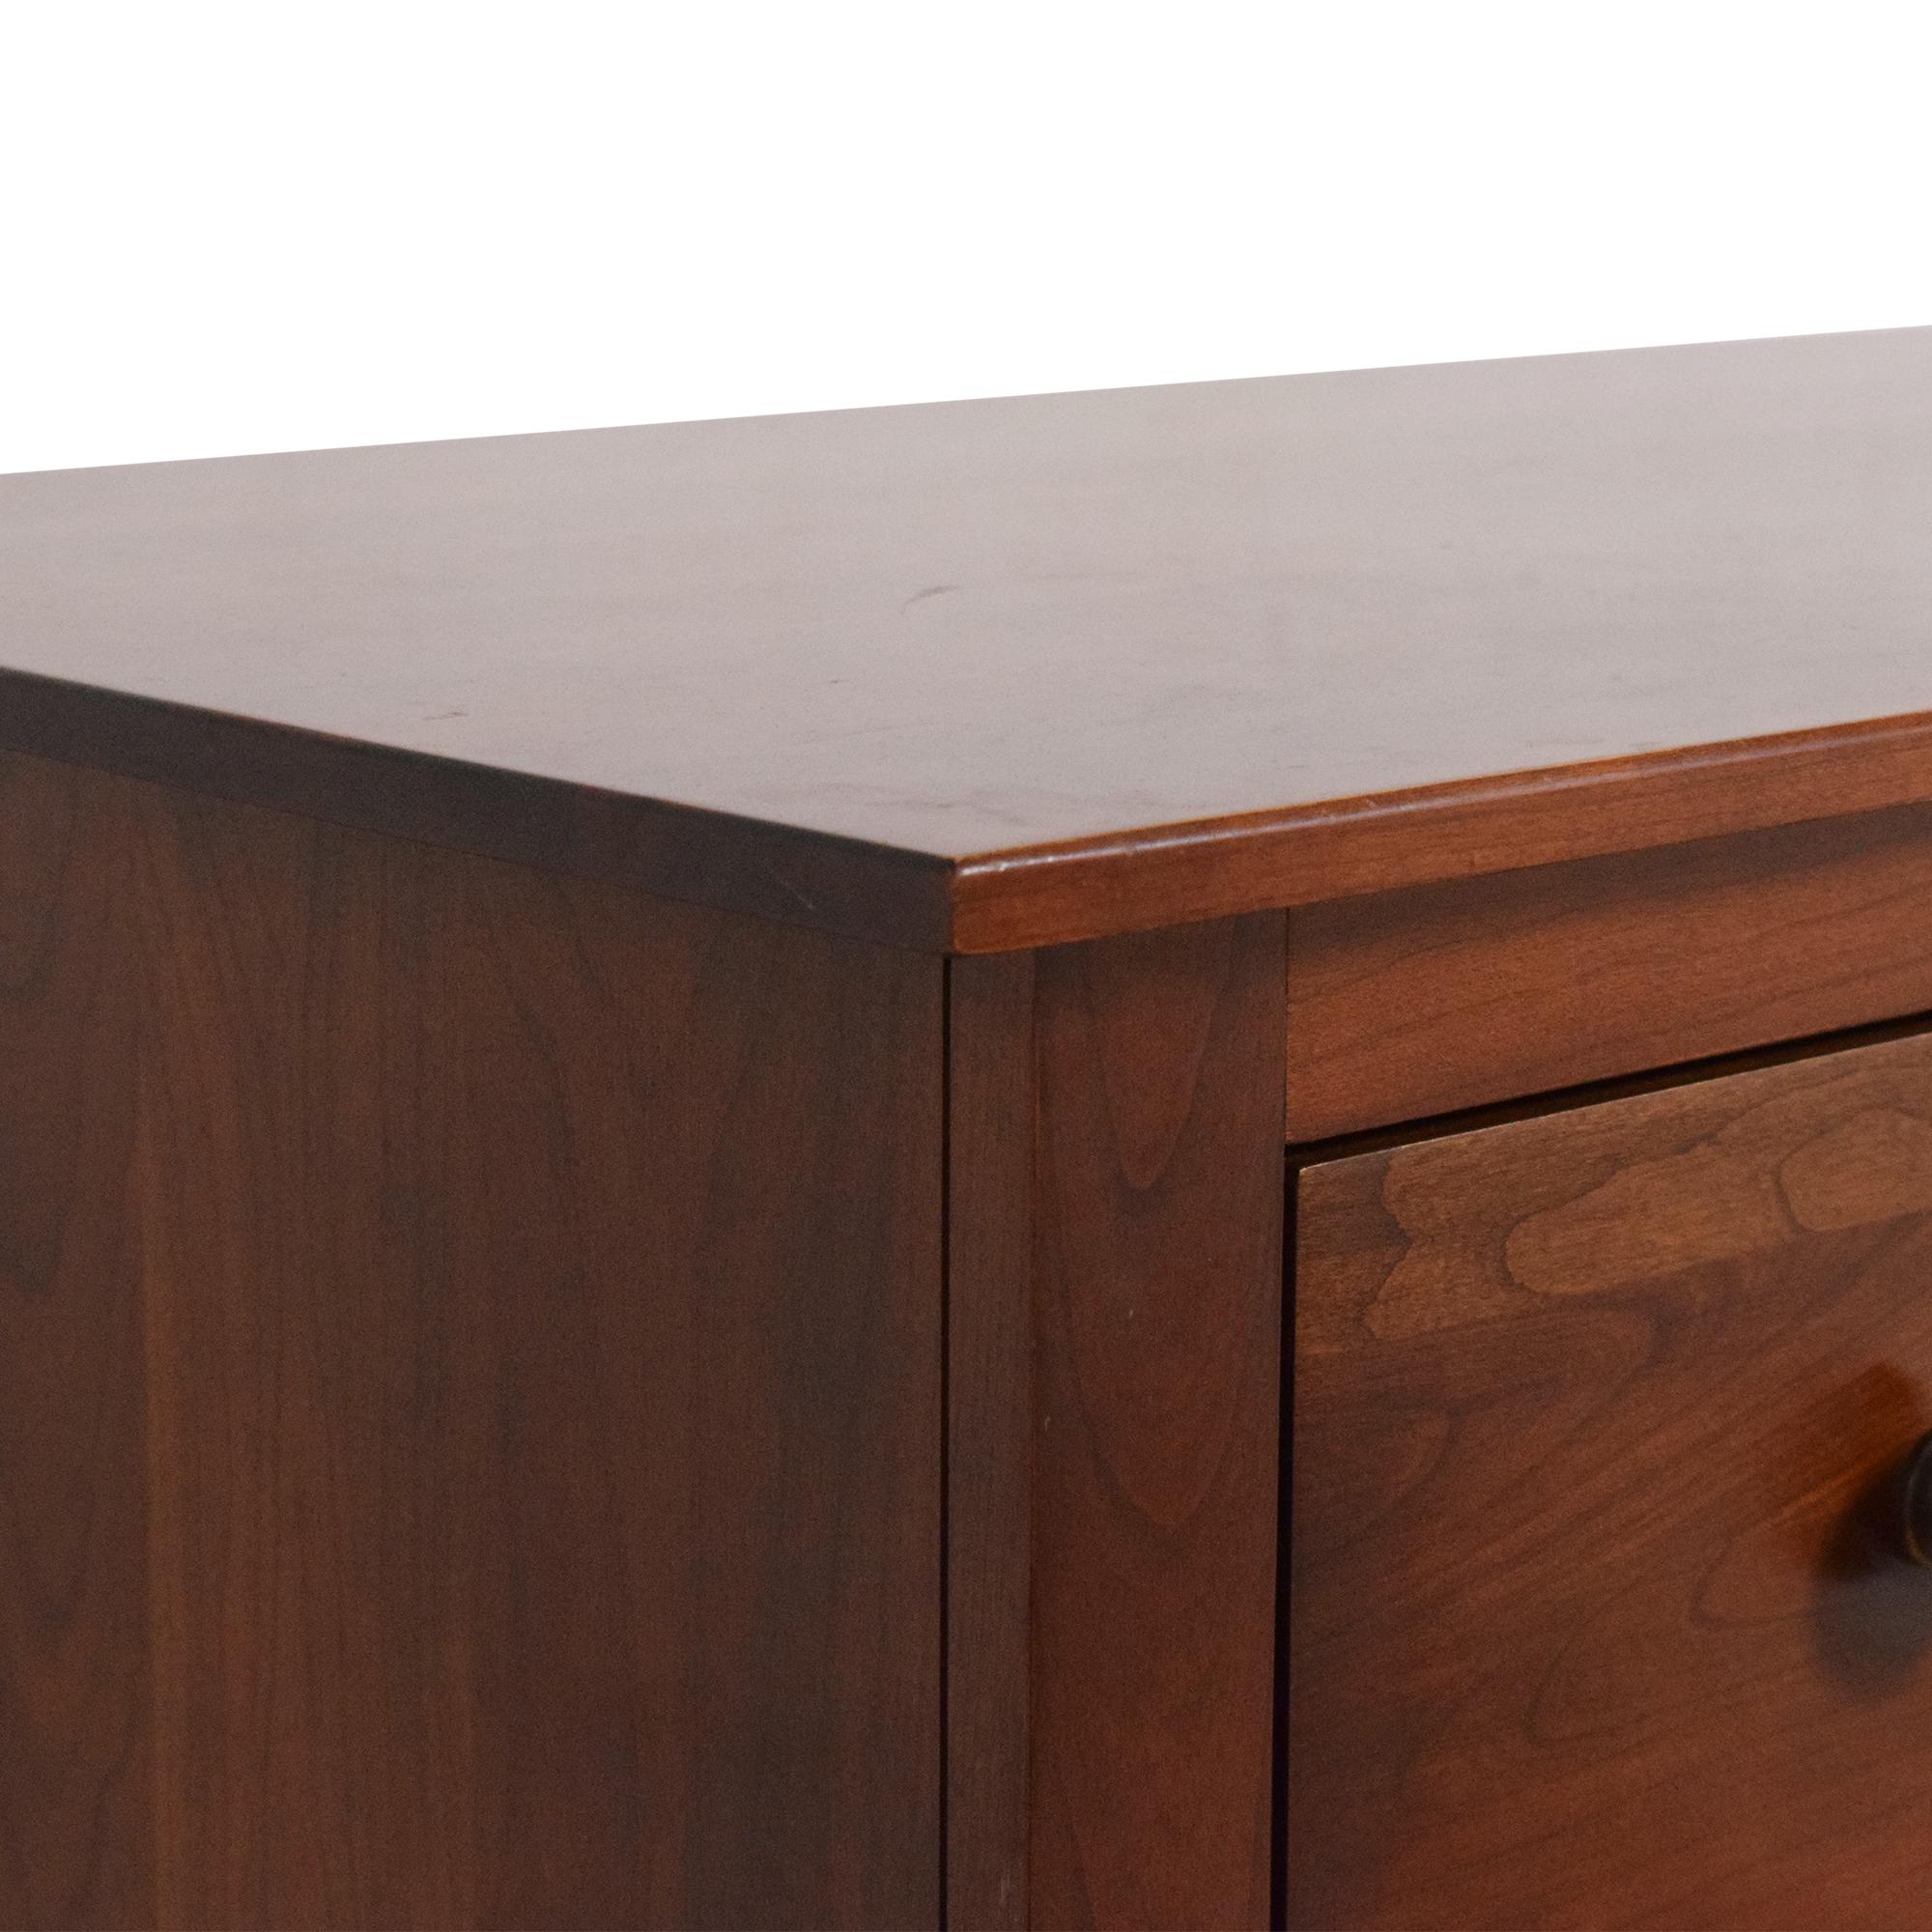 Ethan Allen Ethan Allen American Impressions Tall Dresser discount